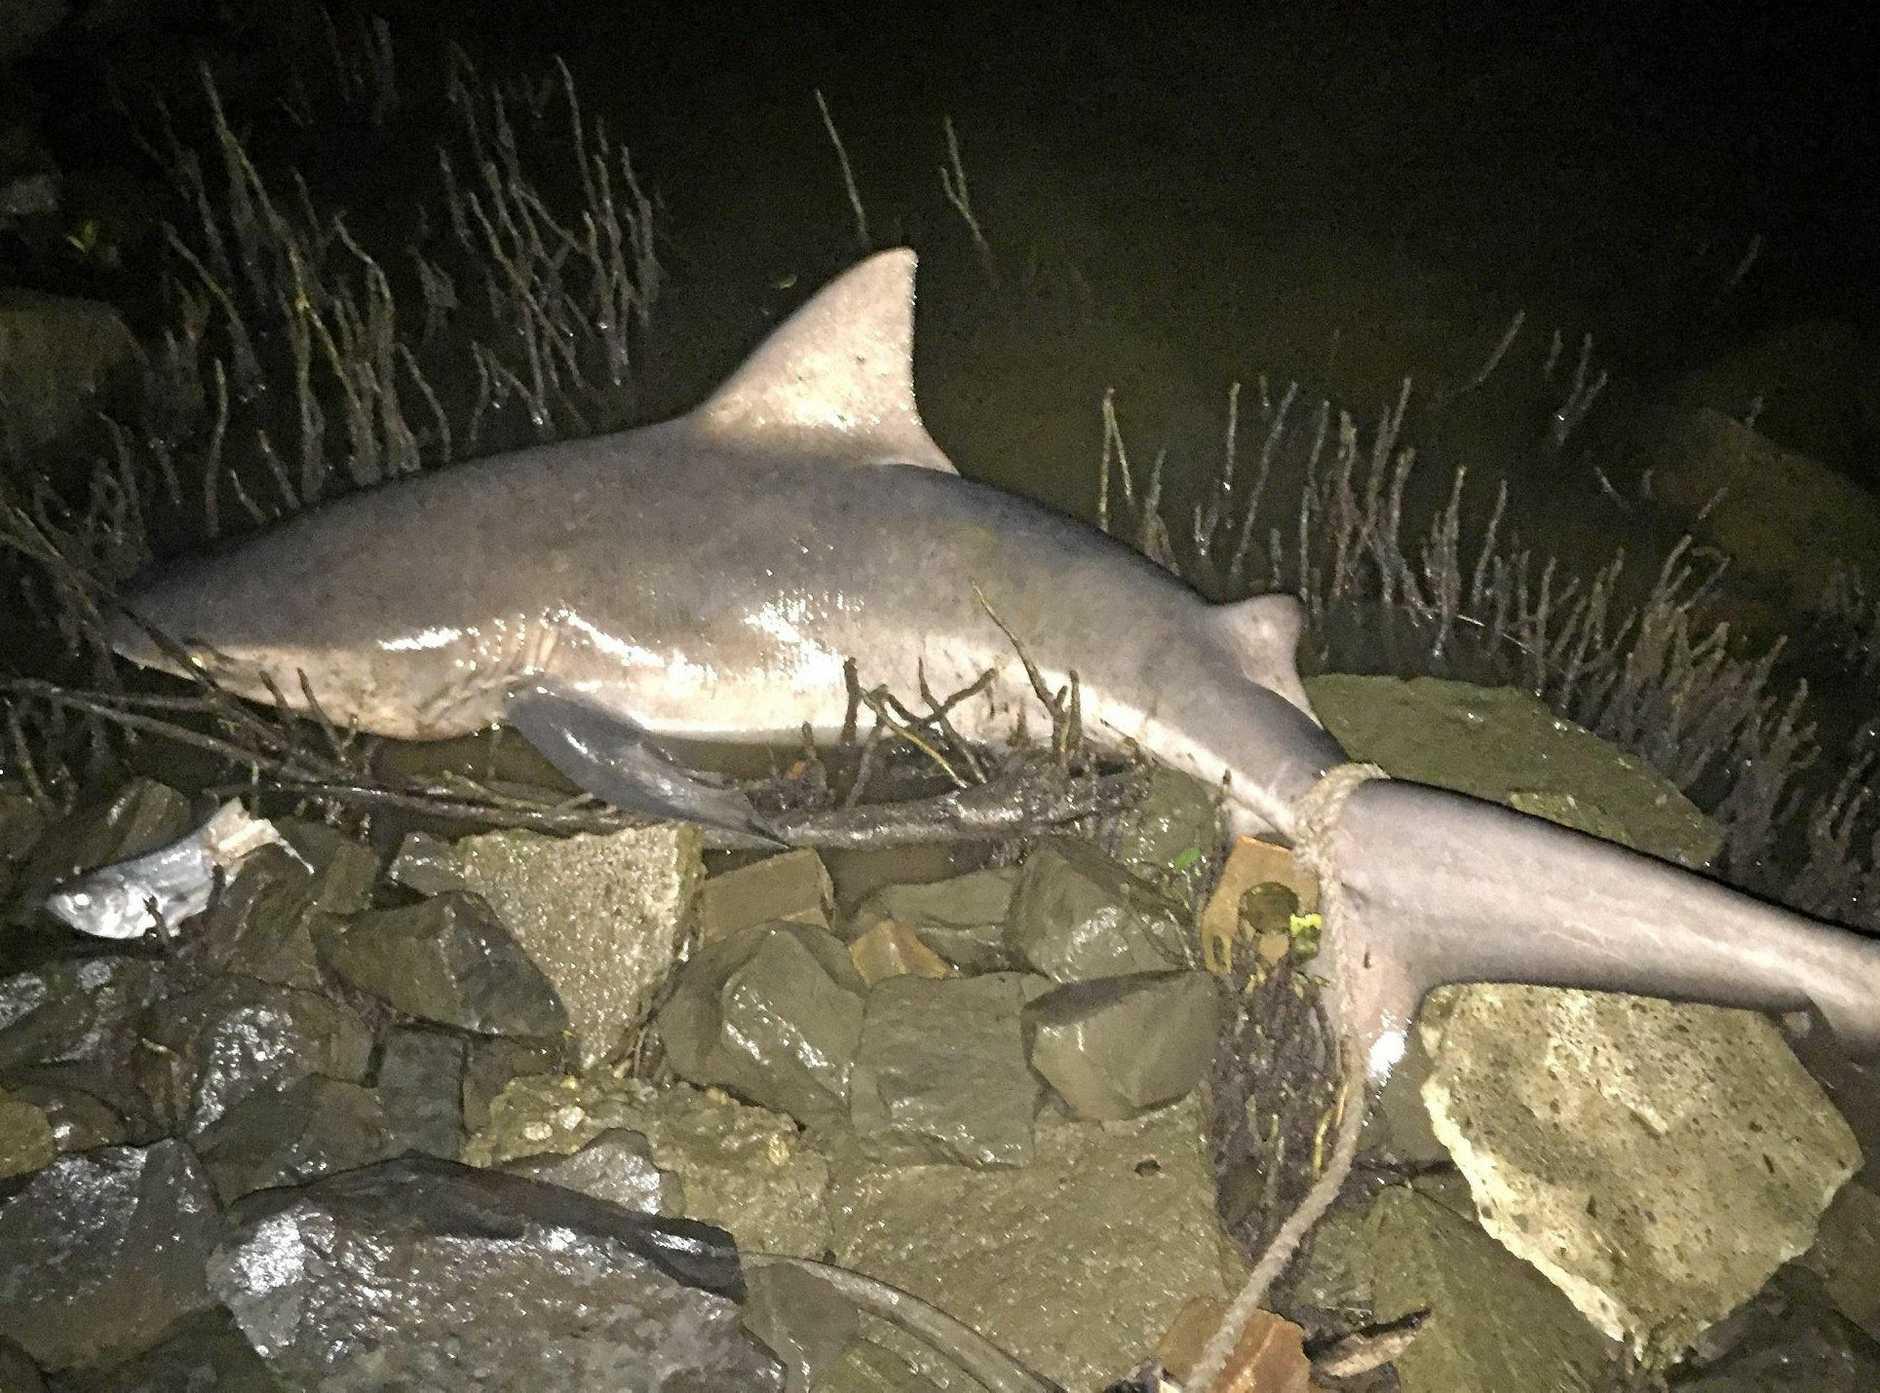 BIG CATCH: Ballina local Joe Cunningham caught a 1.5m bull shark near the Wardell bridge on Sunday night, April, 5, 2016.